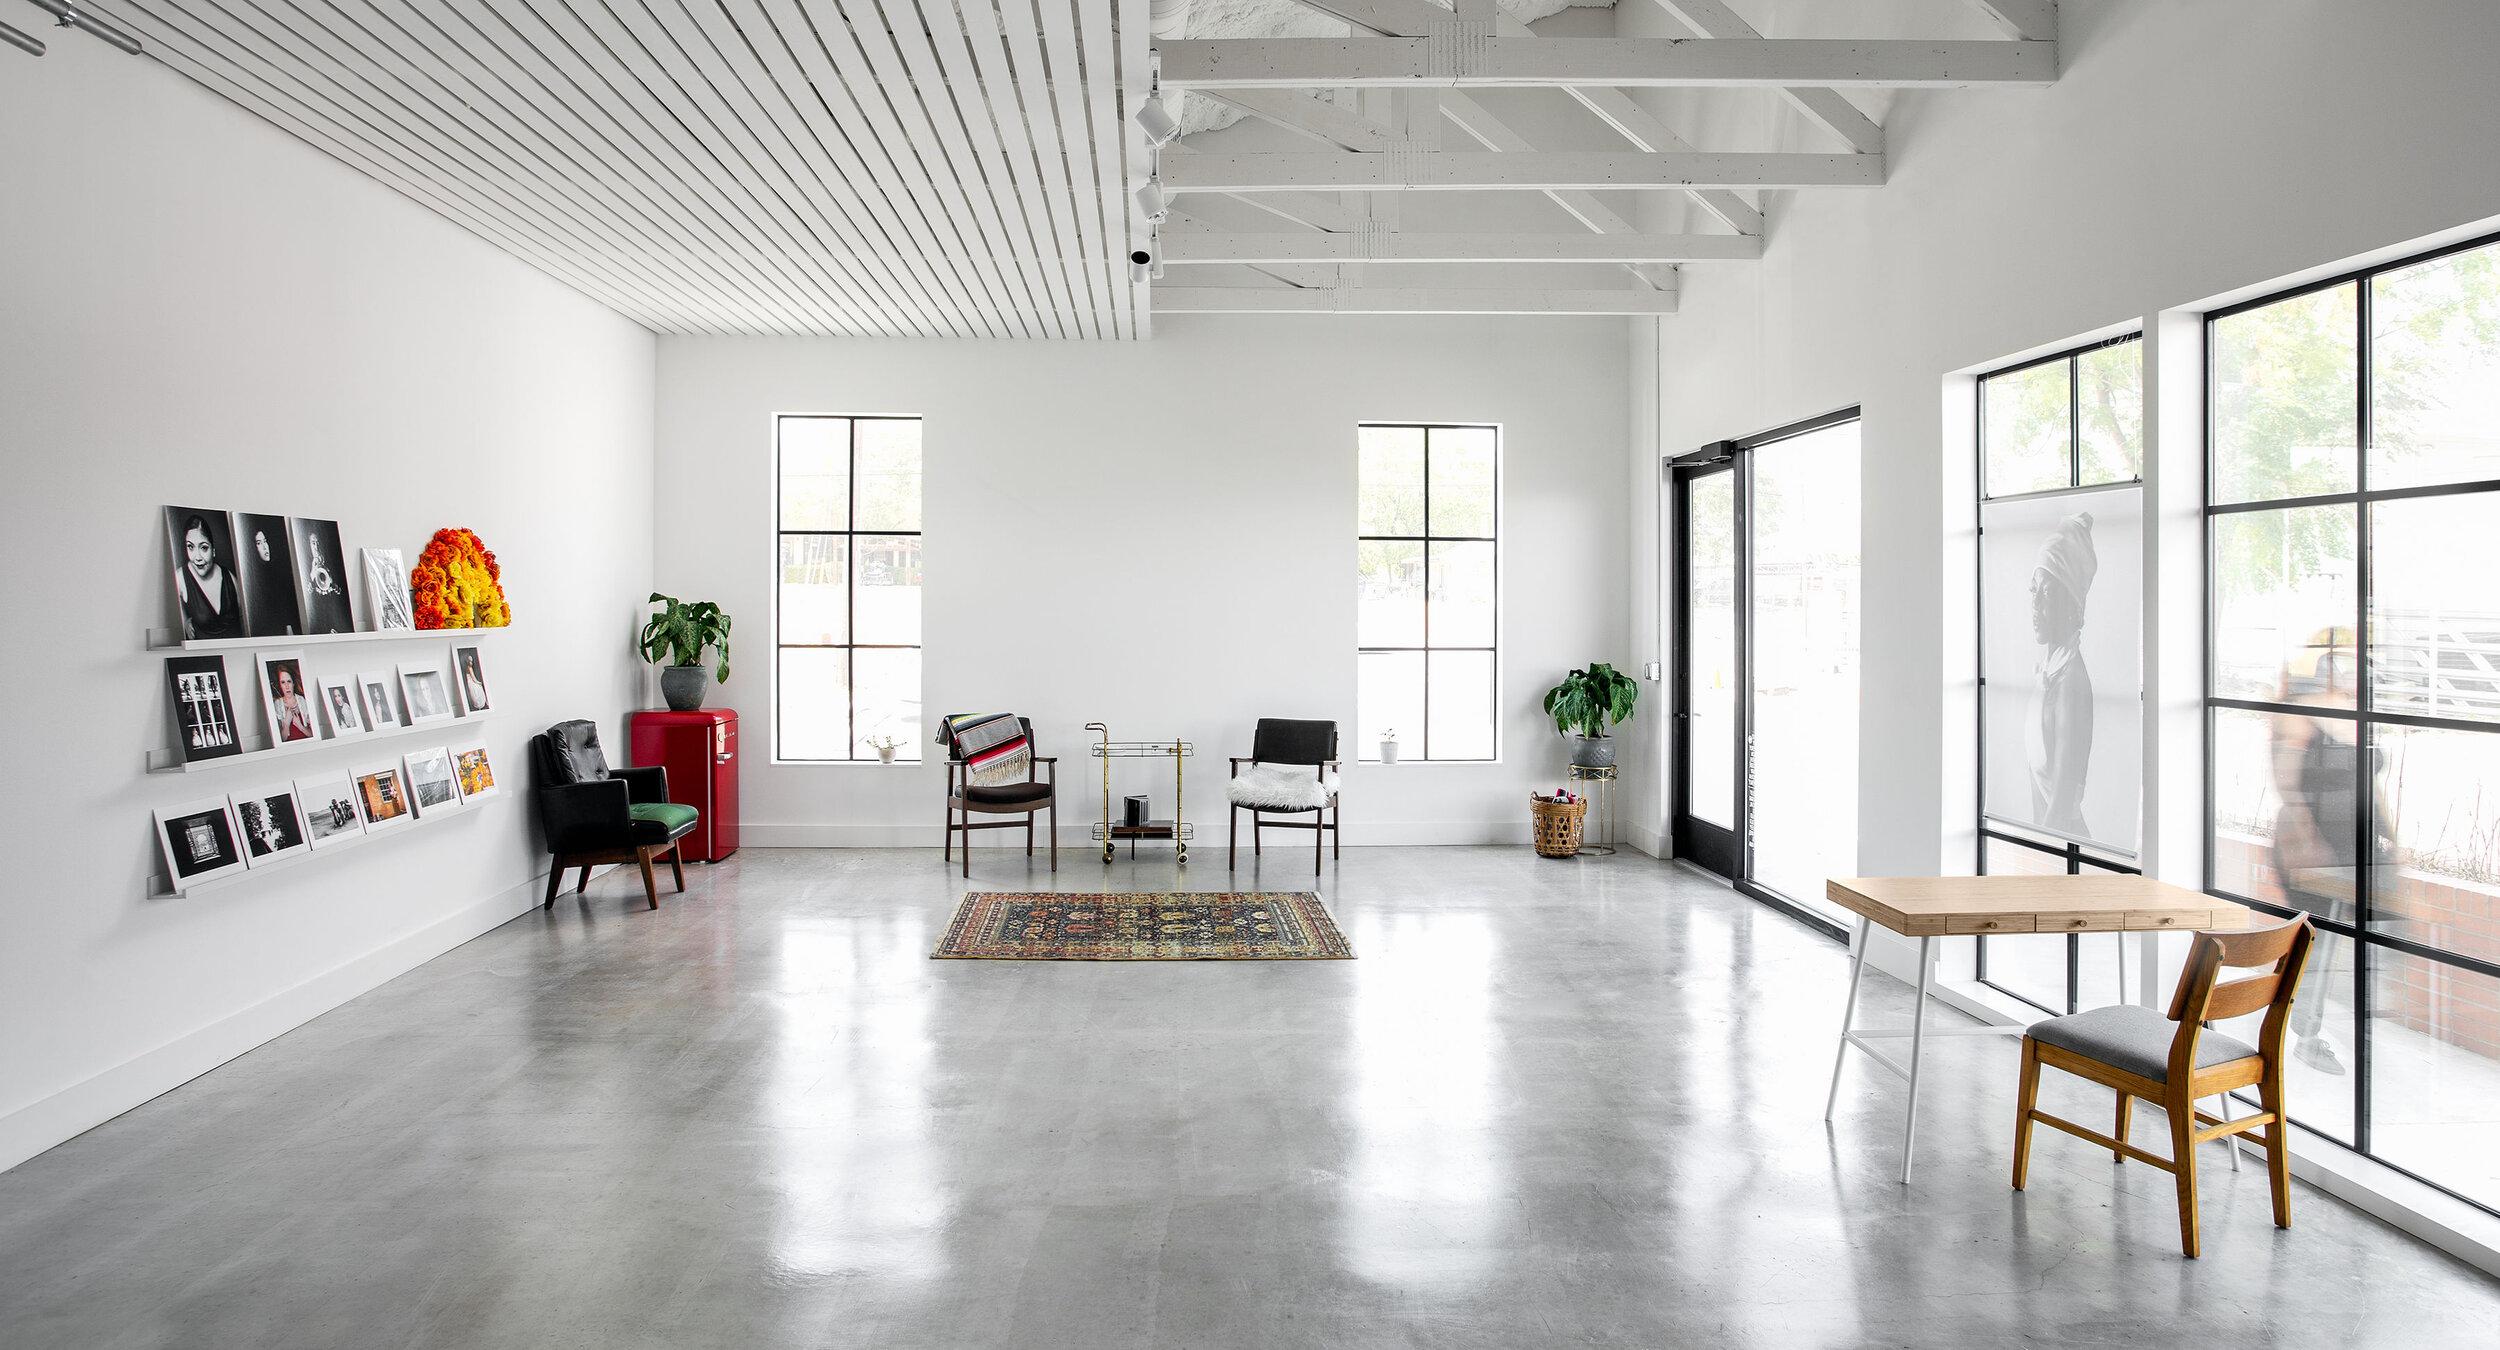 Our brand new studio in South Austin. Photo by: Sean Carranza